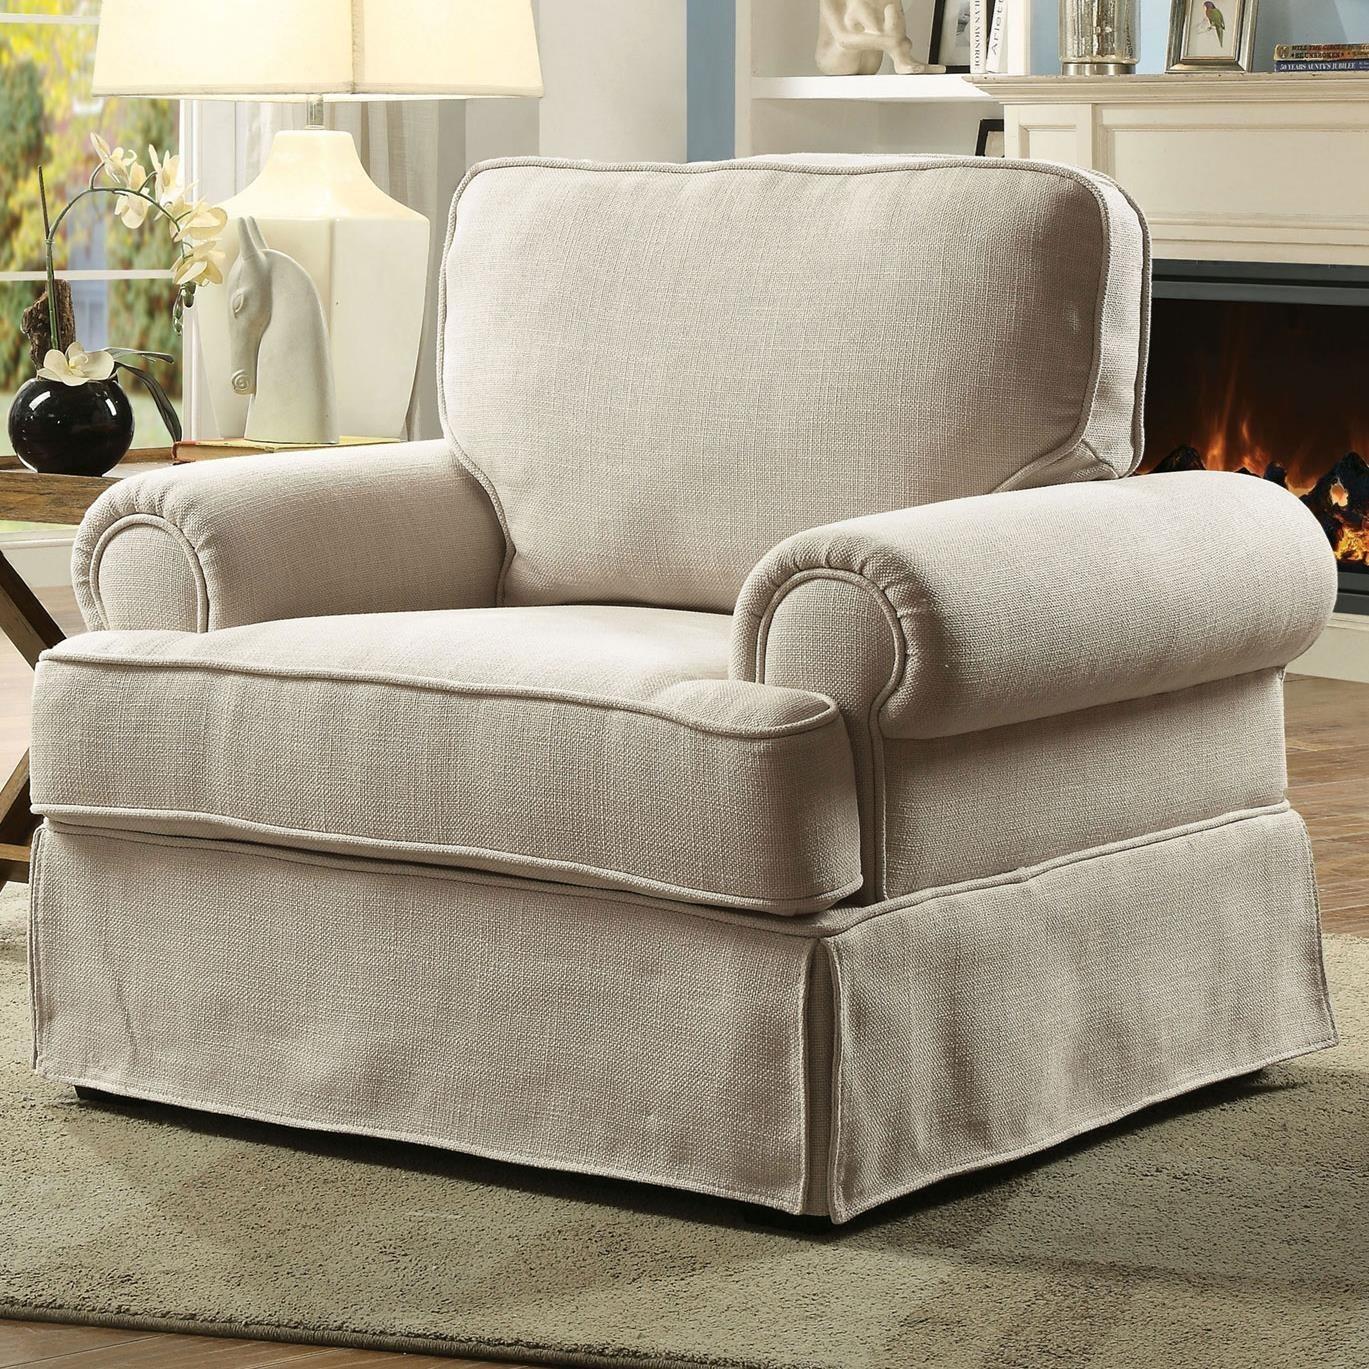 Furniture of America Badalona I Casual Skirted Chair | Rooms ...